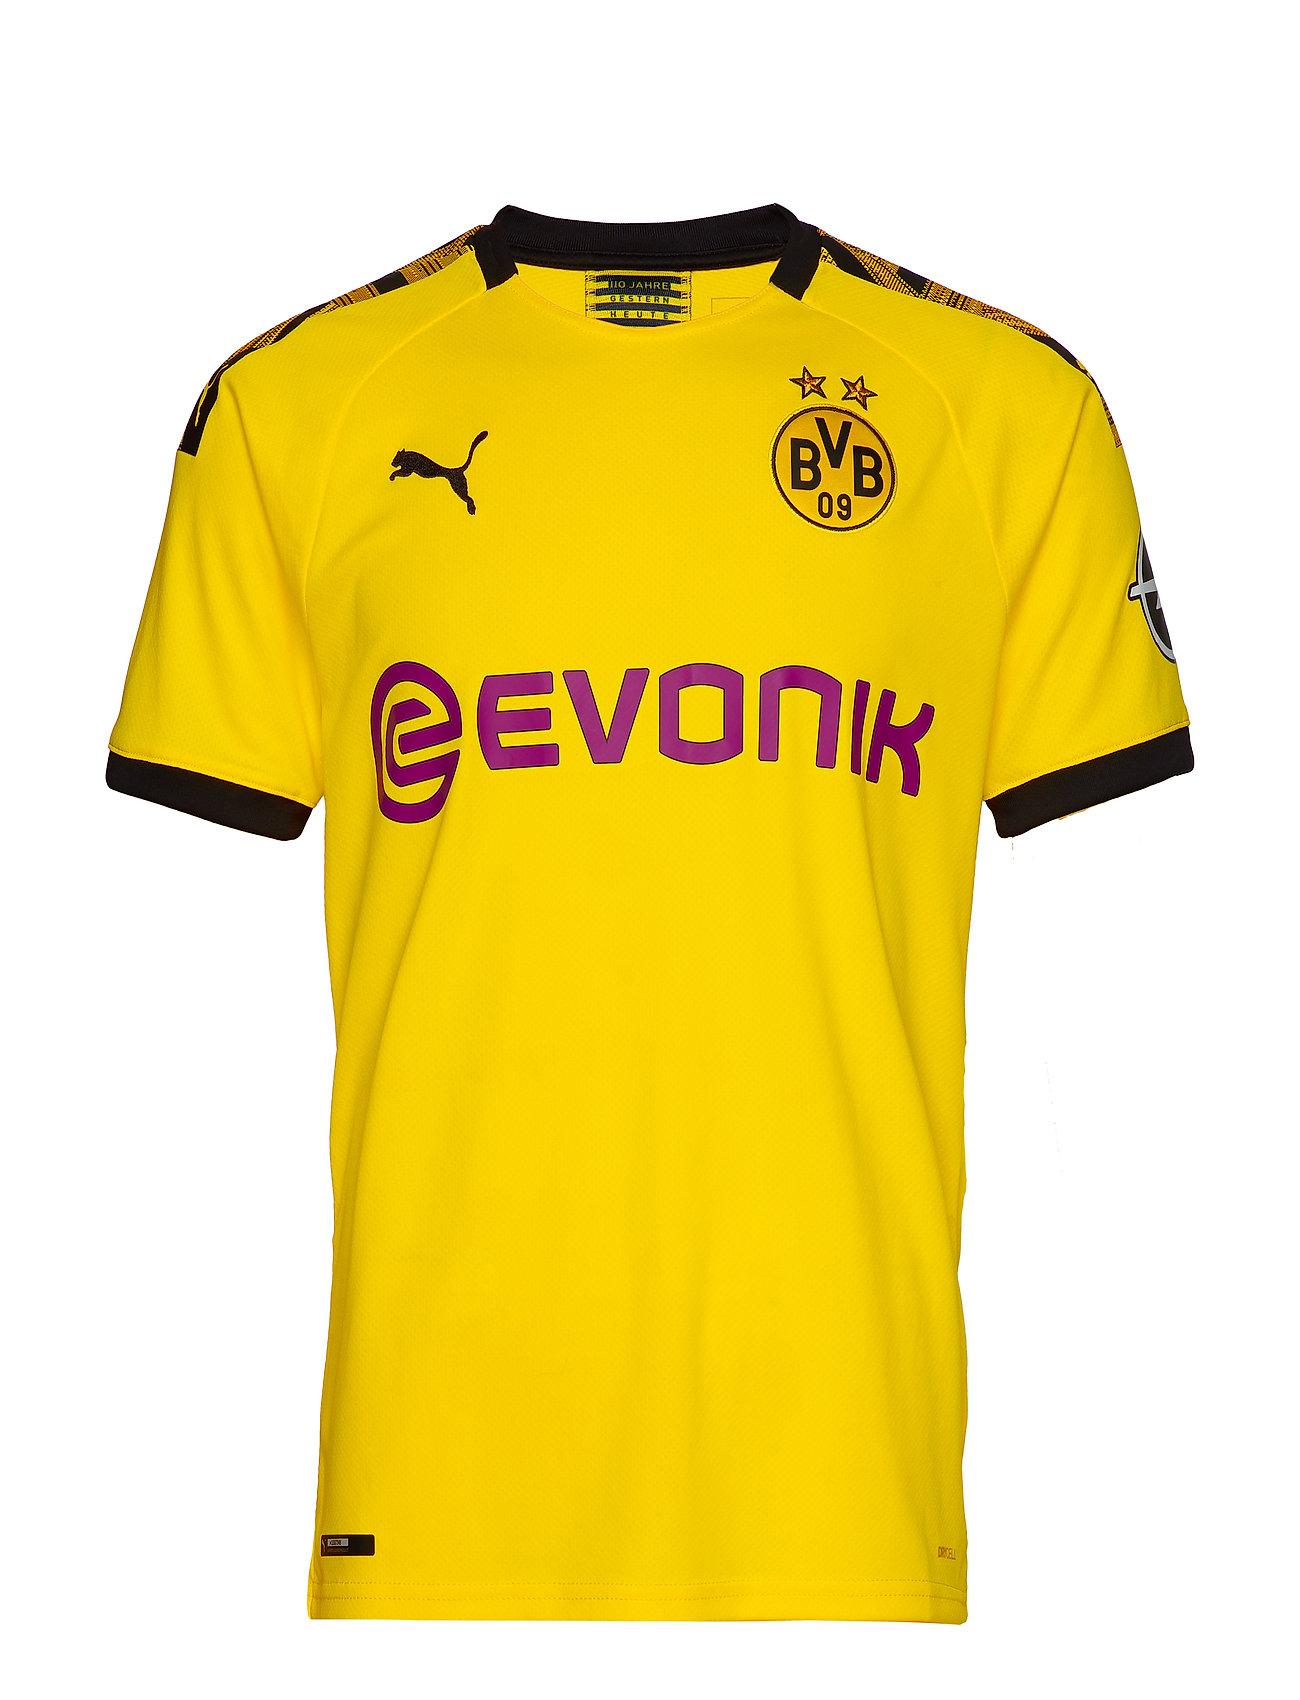 Home Shirt Opelcyber puma BlackPuma Evonik Replica Bvb With Logo Yellow 6g7yvYbf